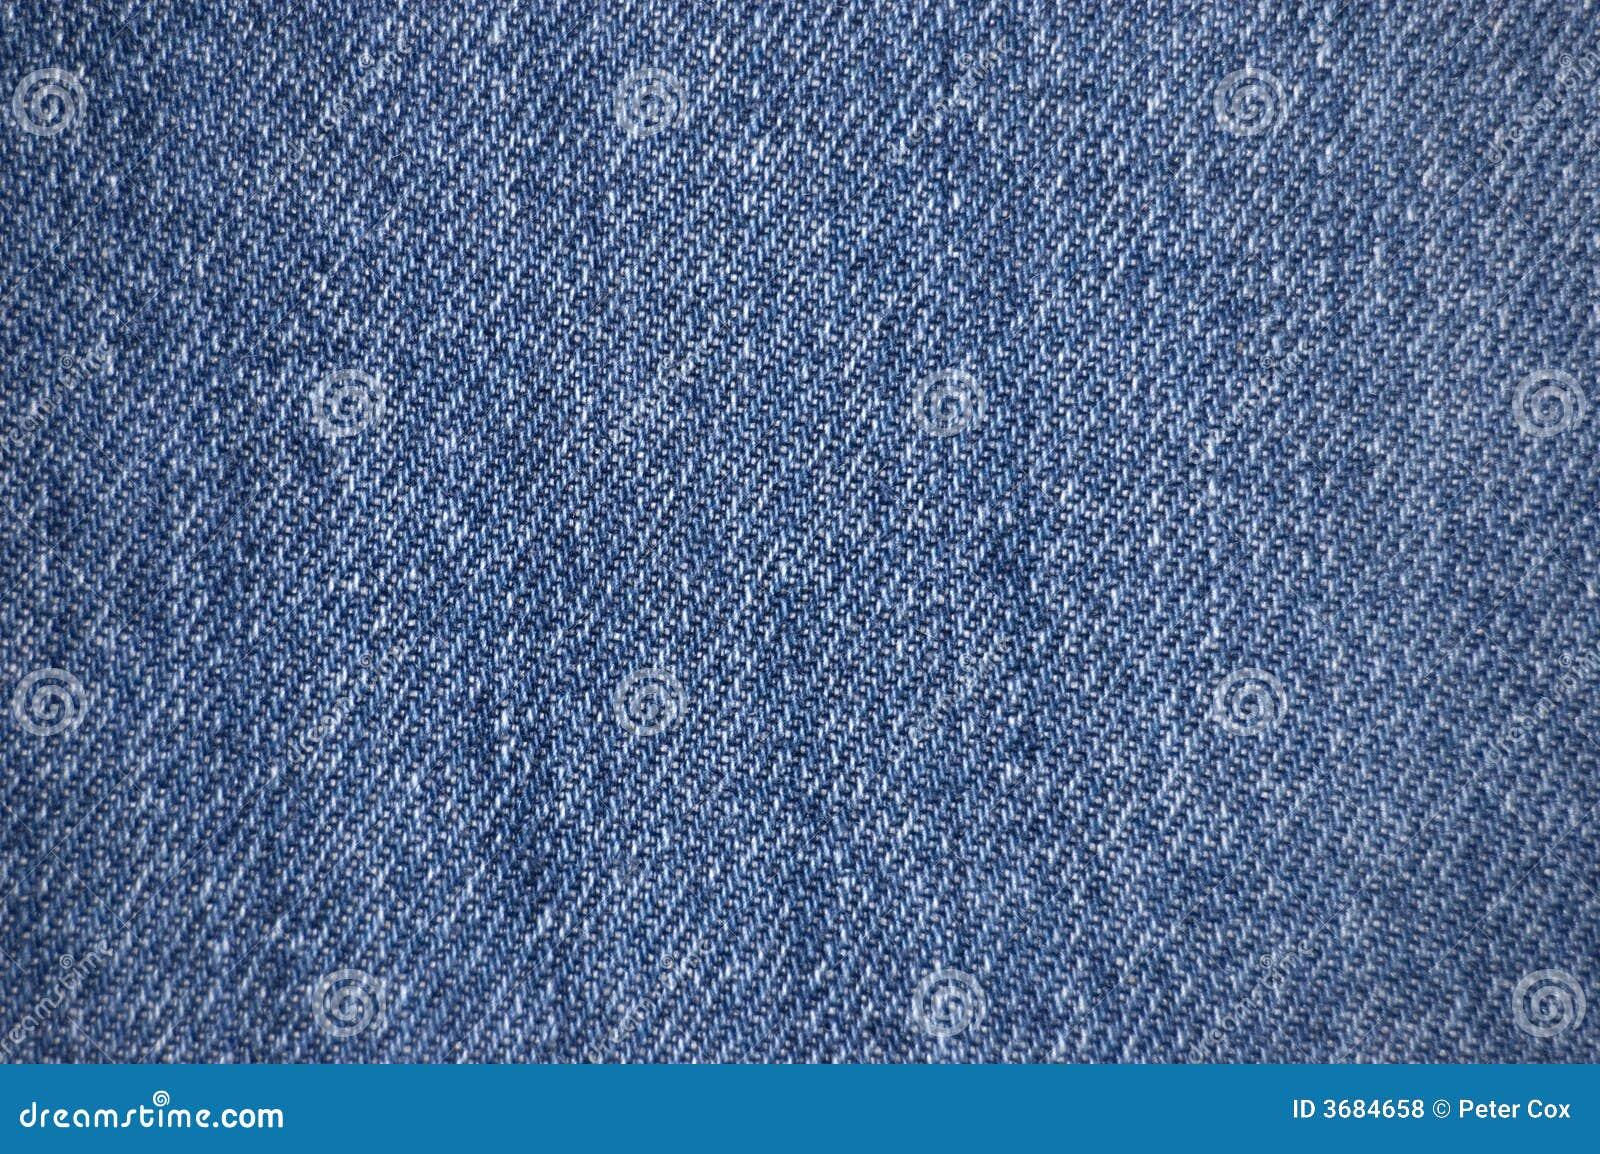 denim fabric texture - photo #19